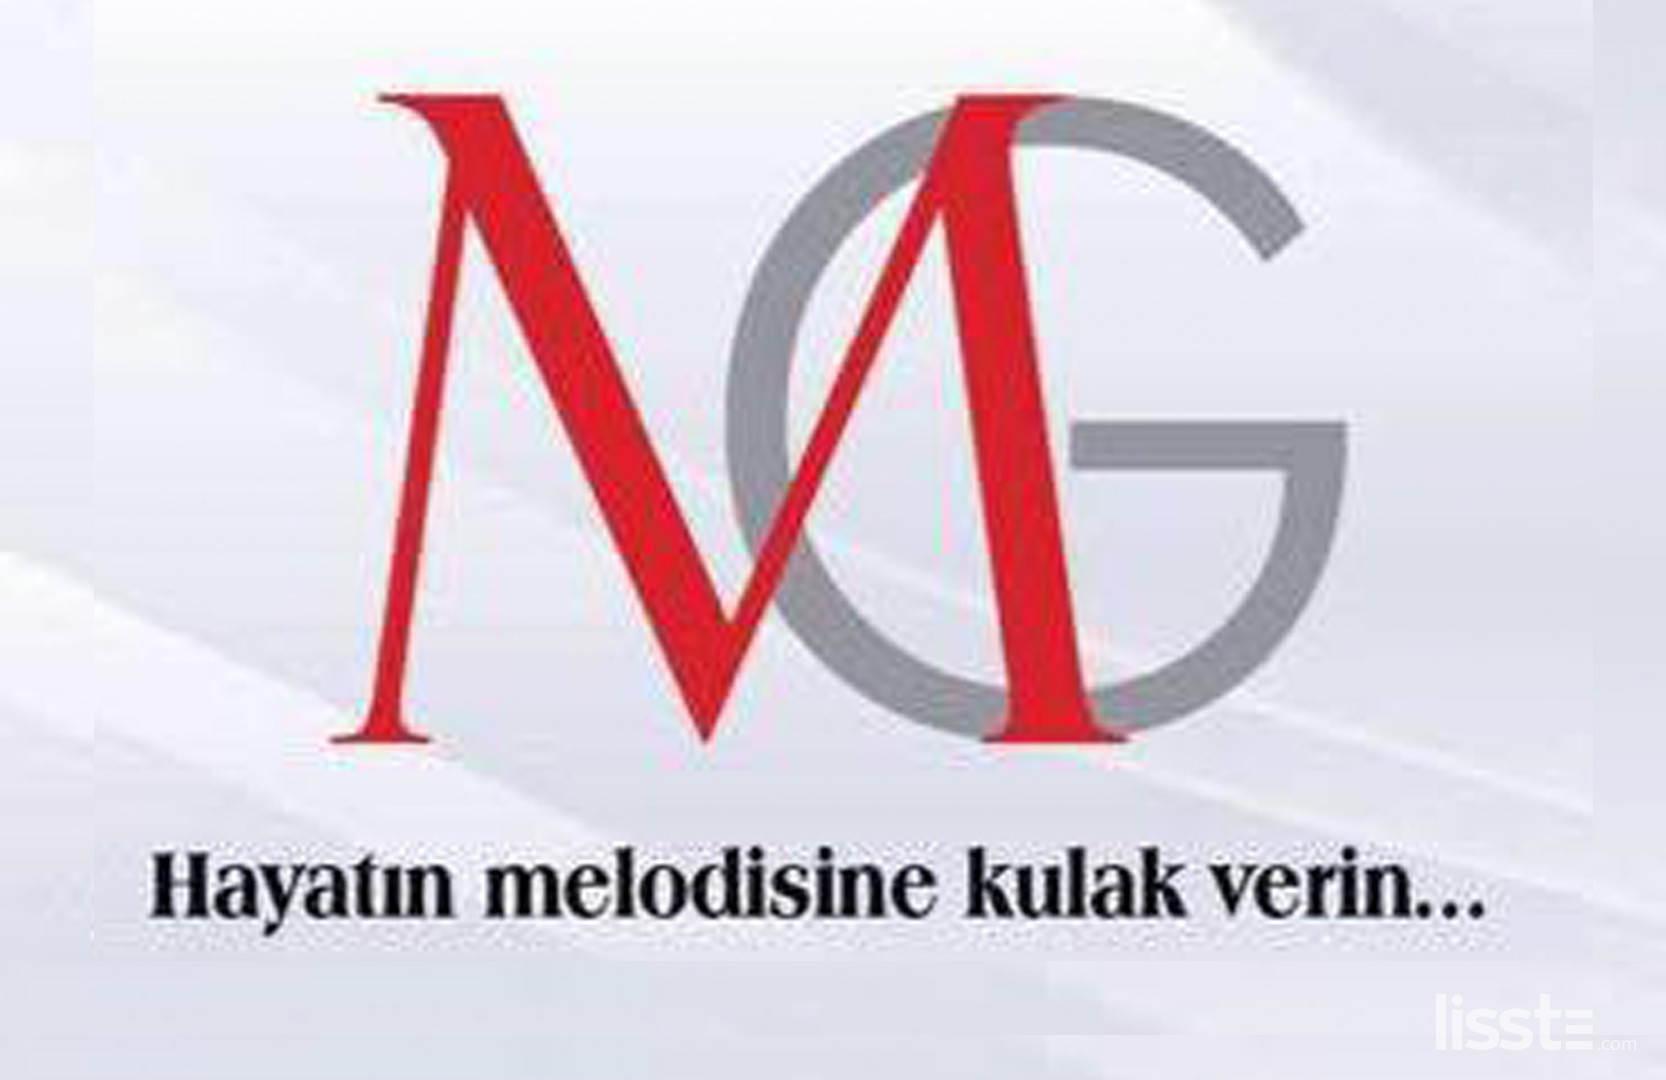 melodi-1559127693.jpg